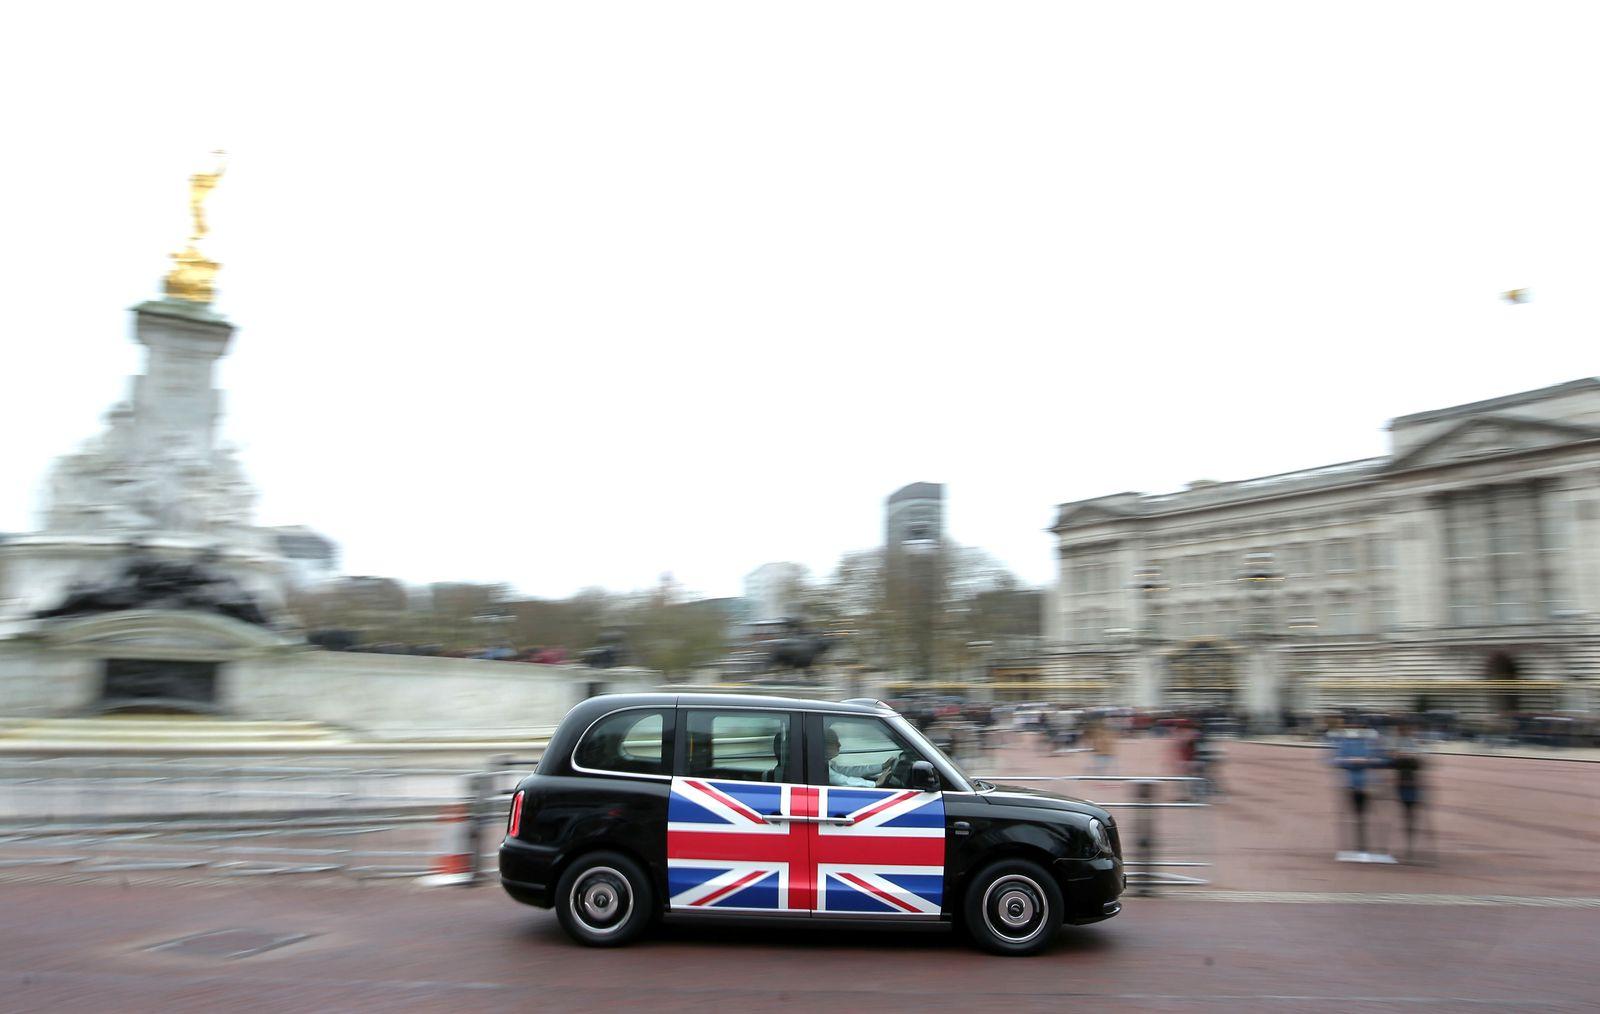 London / Mobilität